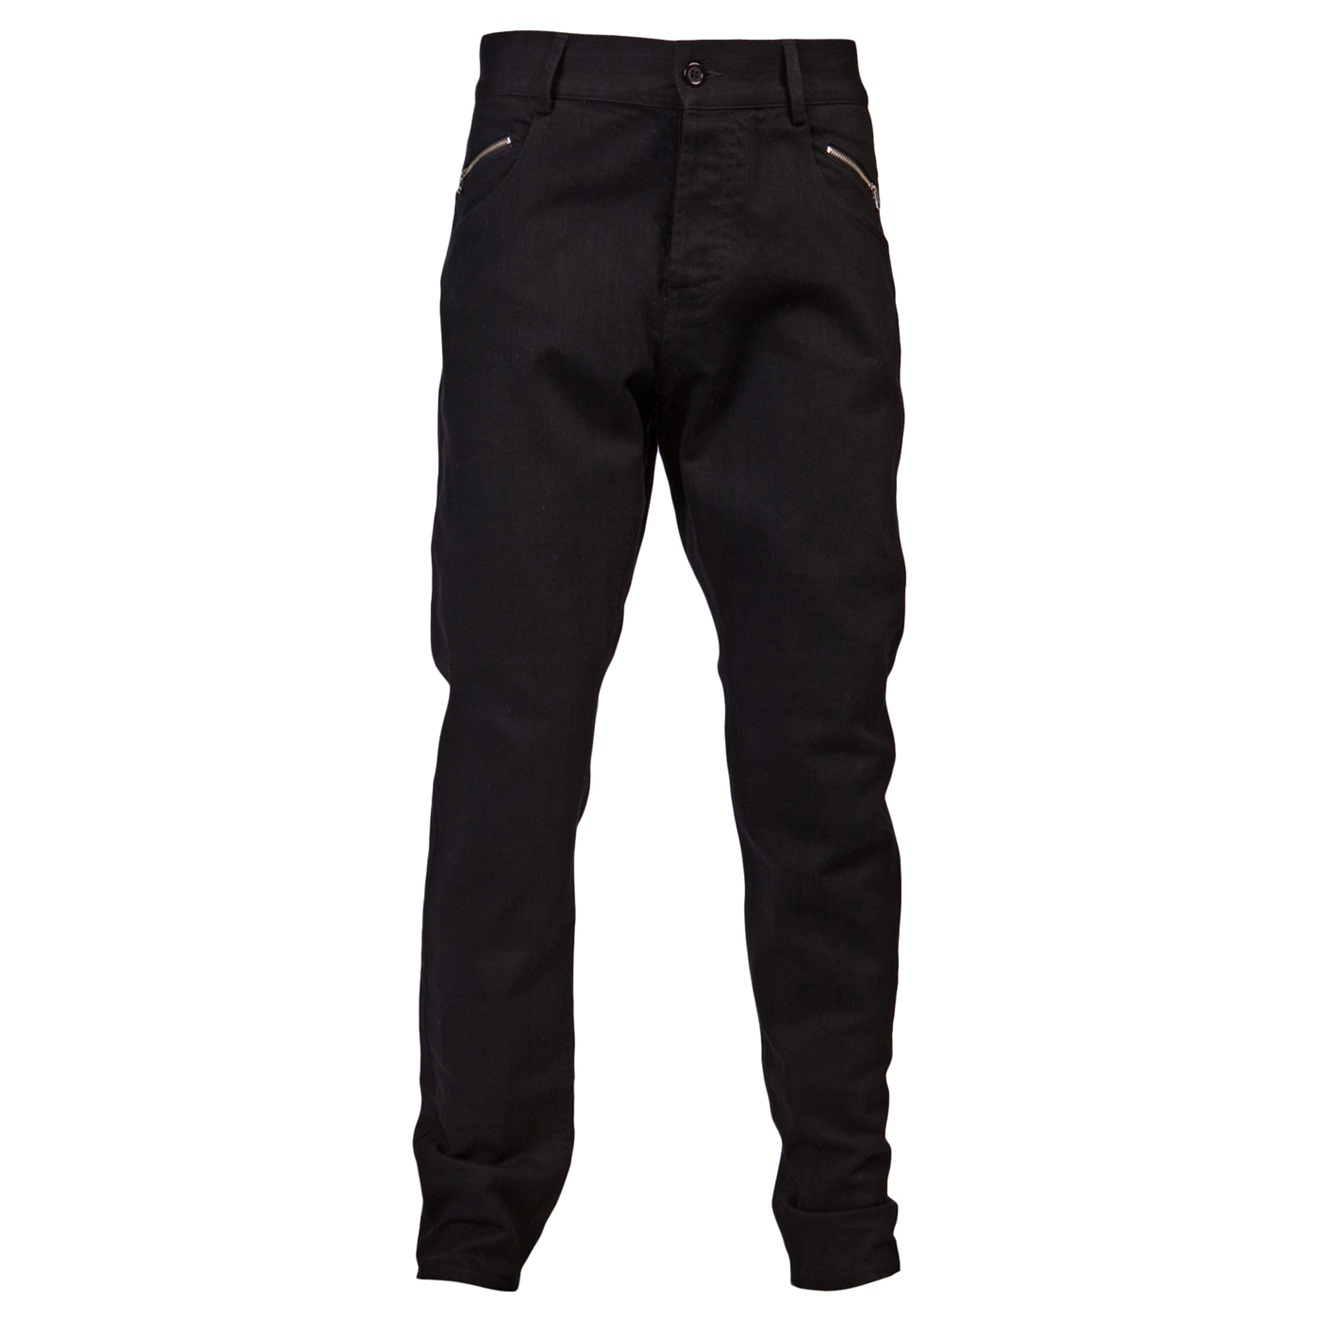 Cheap True Religion Jeans Mens Images Shirt Skinny